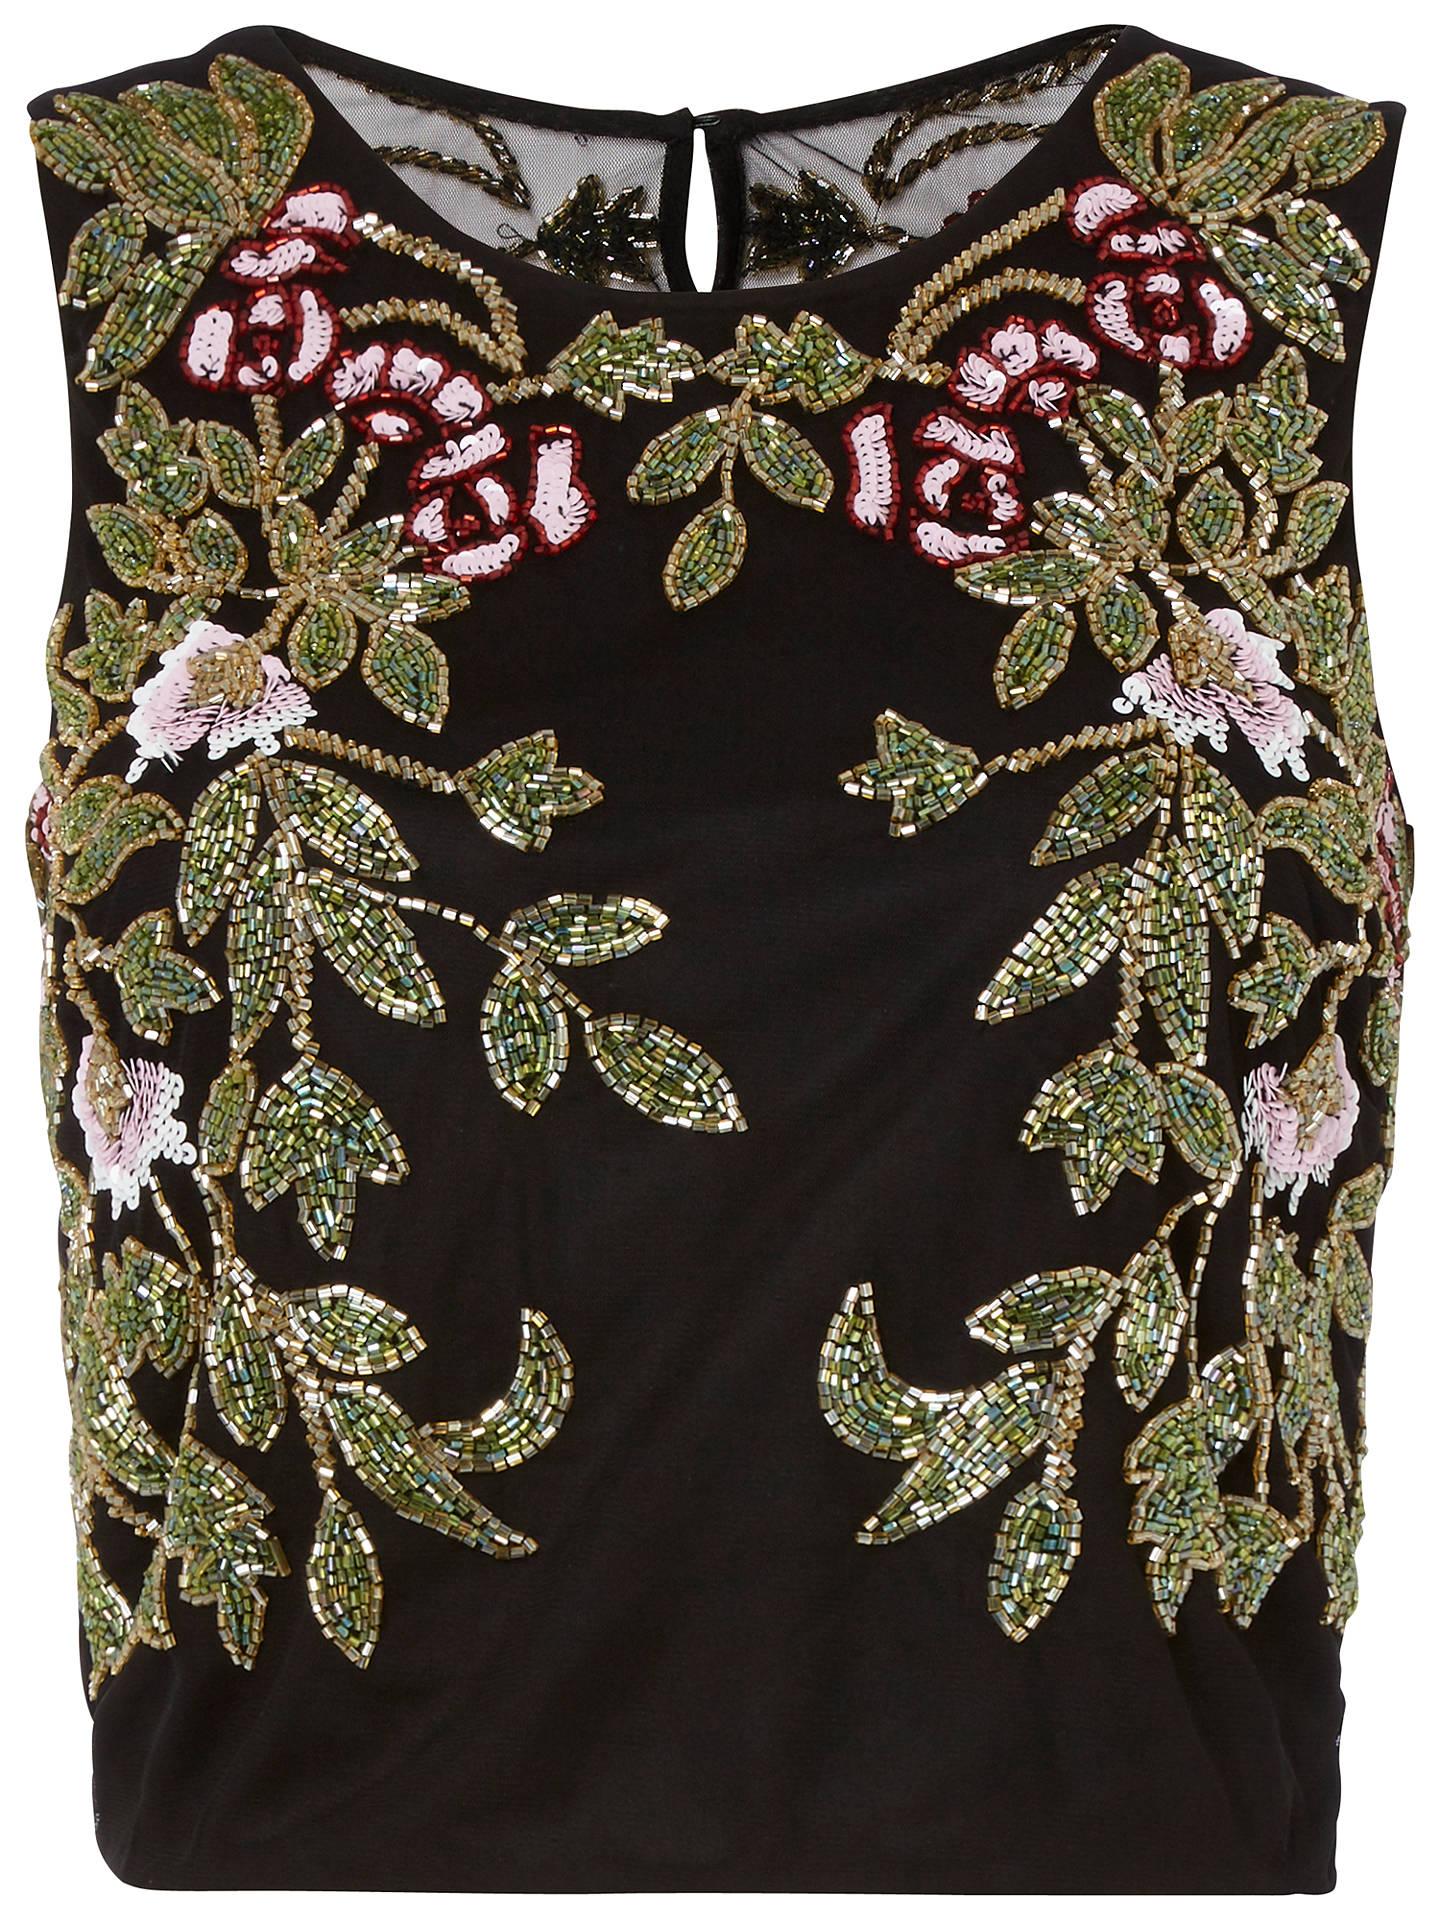 ab9e6a1fb7d Buy Raishma Floral Embroidered Crop Top, Black, 8 Online at johnlewis.com  ...